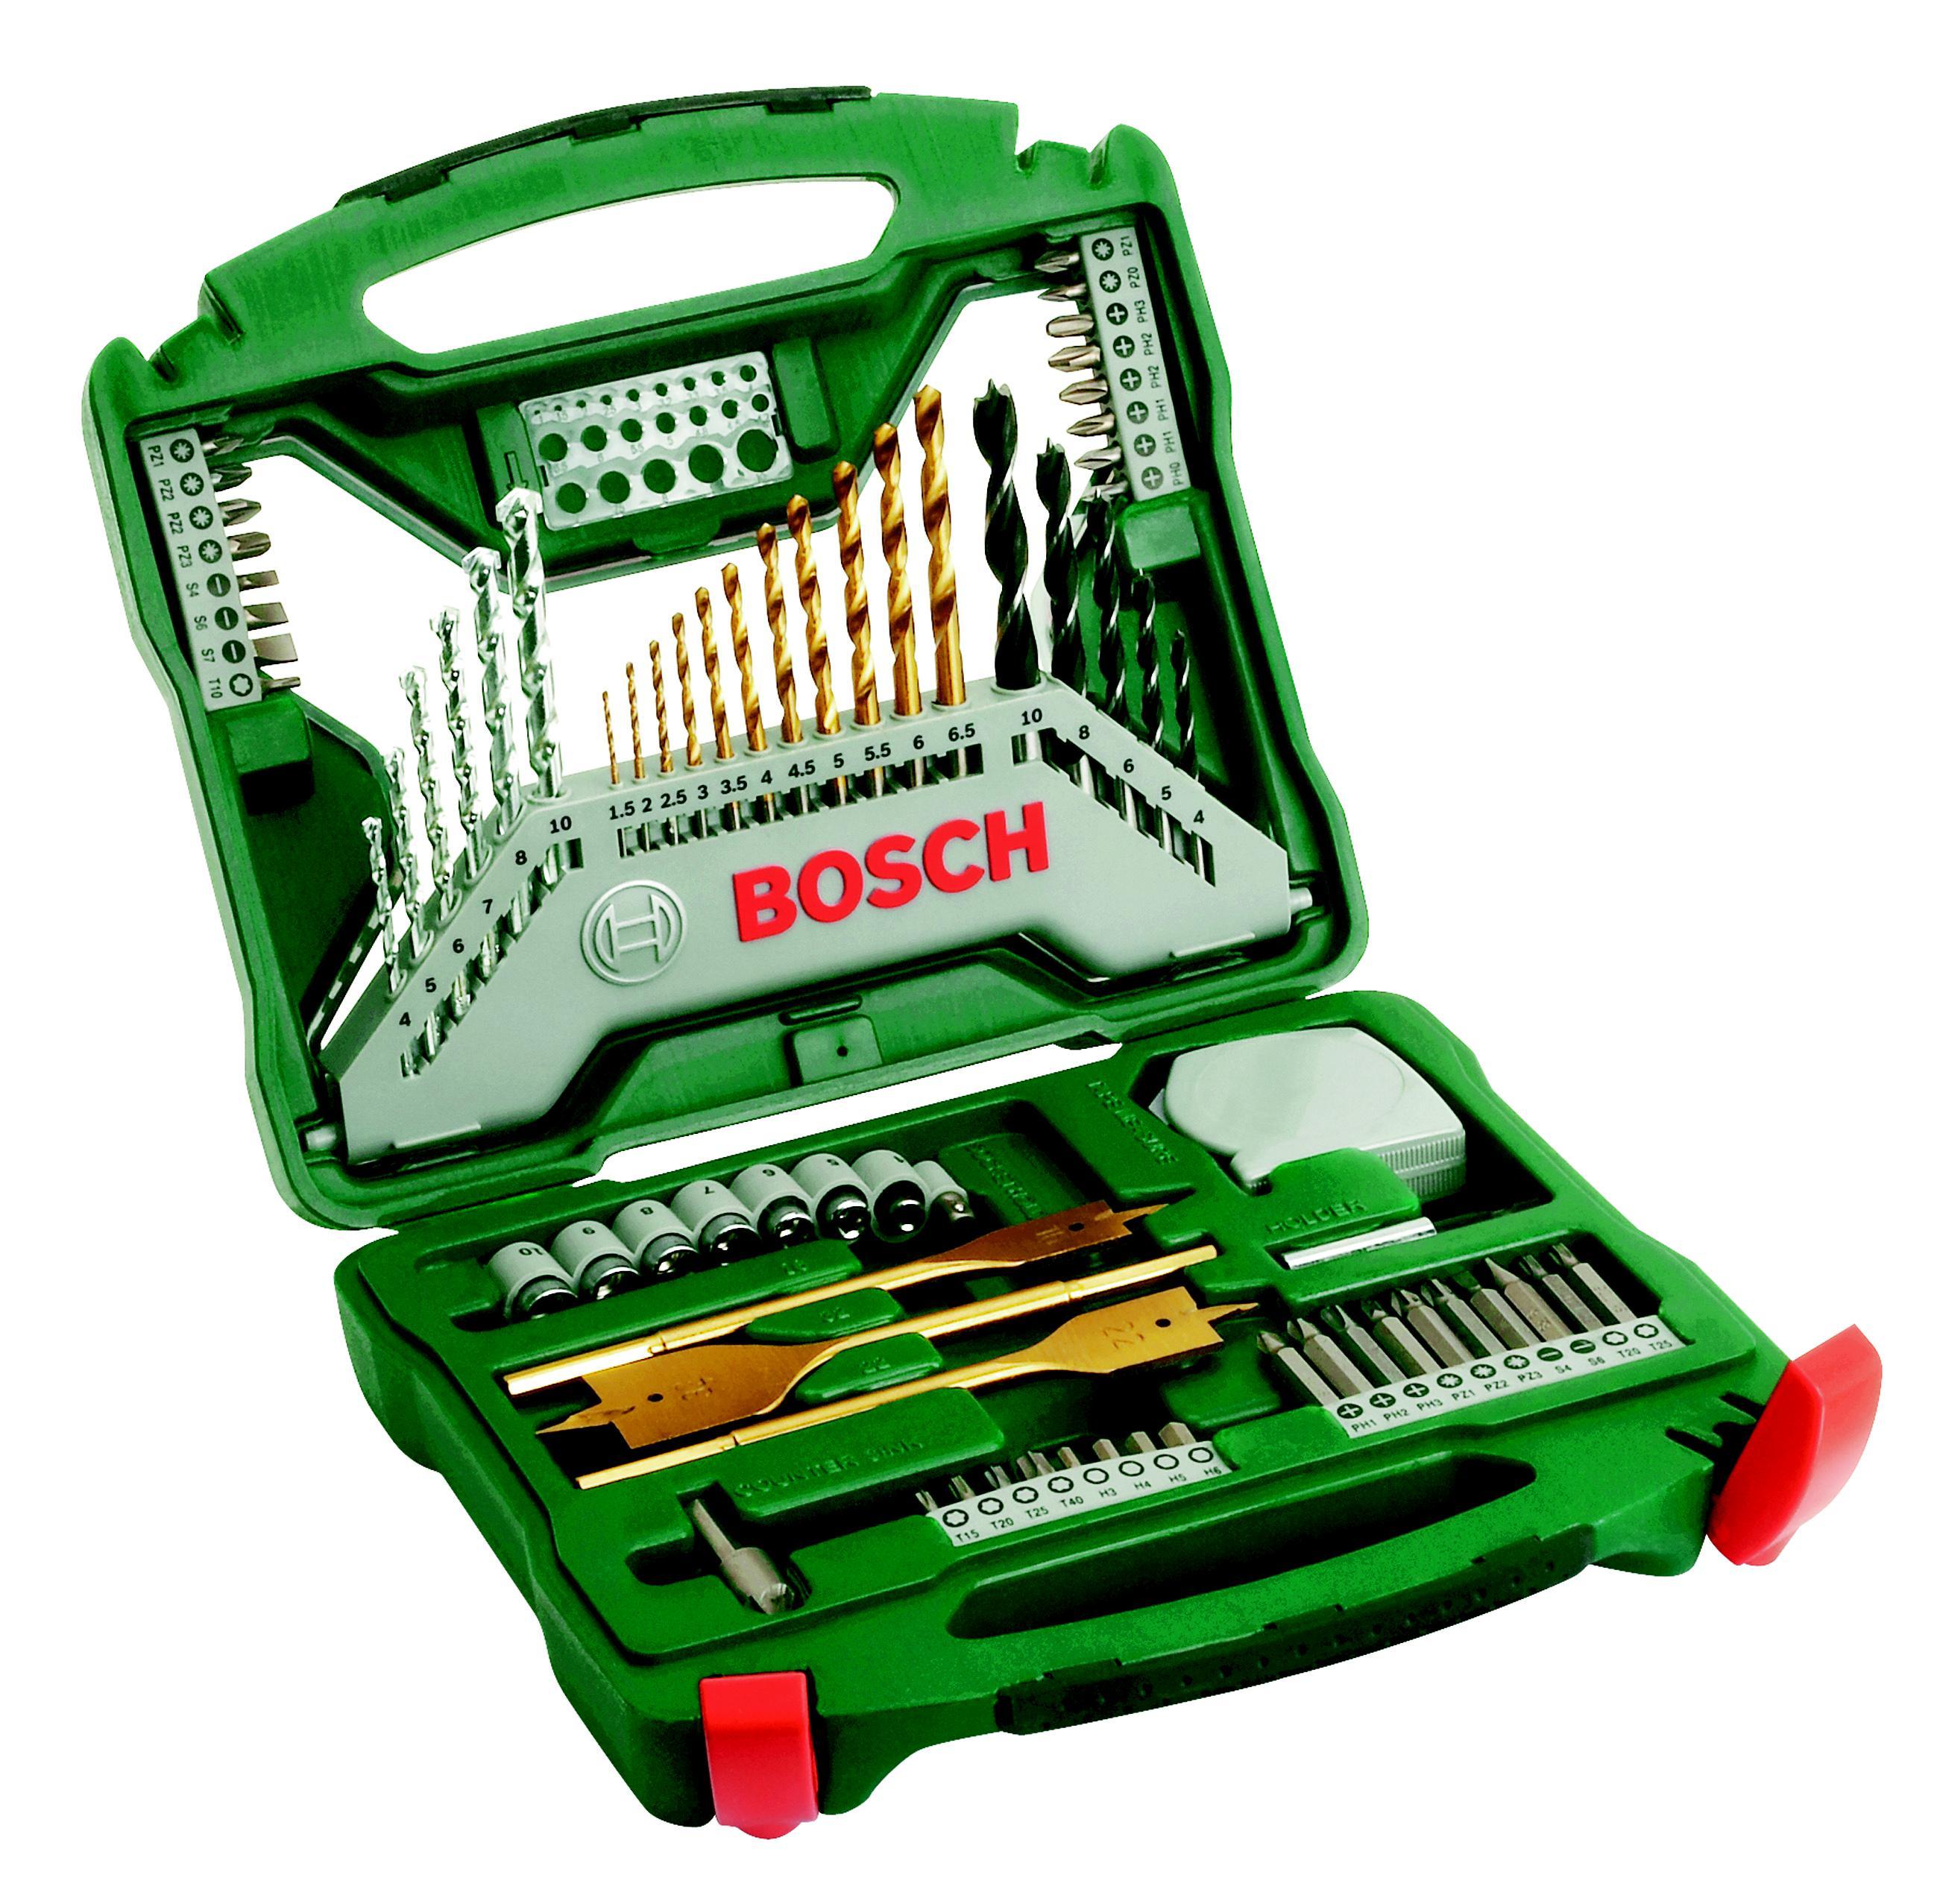 Набор бит и сверл Bosch X-line-70 promoline (2.607.019.329) bosch promoline 2607019450